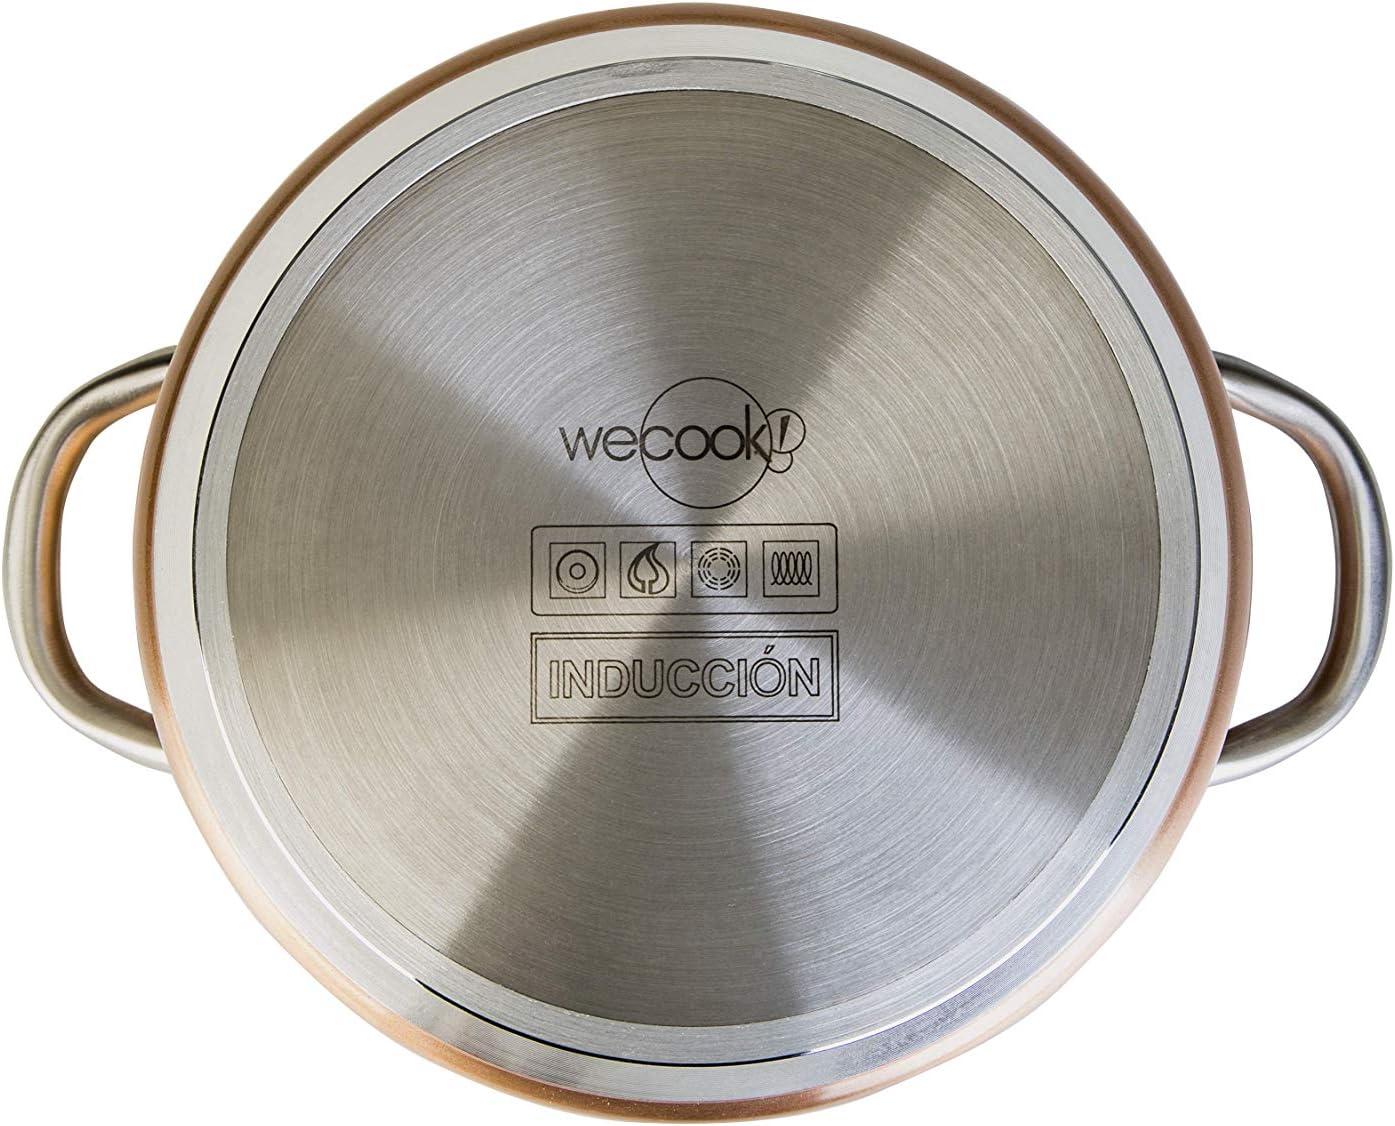 Or 28/x 28/x 25/cm WECOOK Sauteuse Haute Professionnel Aluminium forg/é